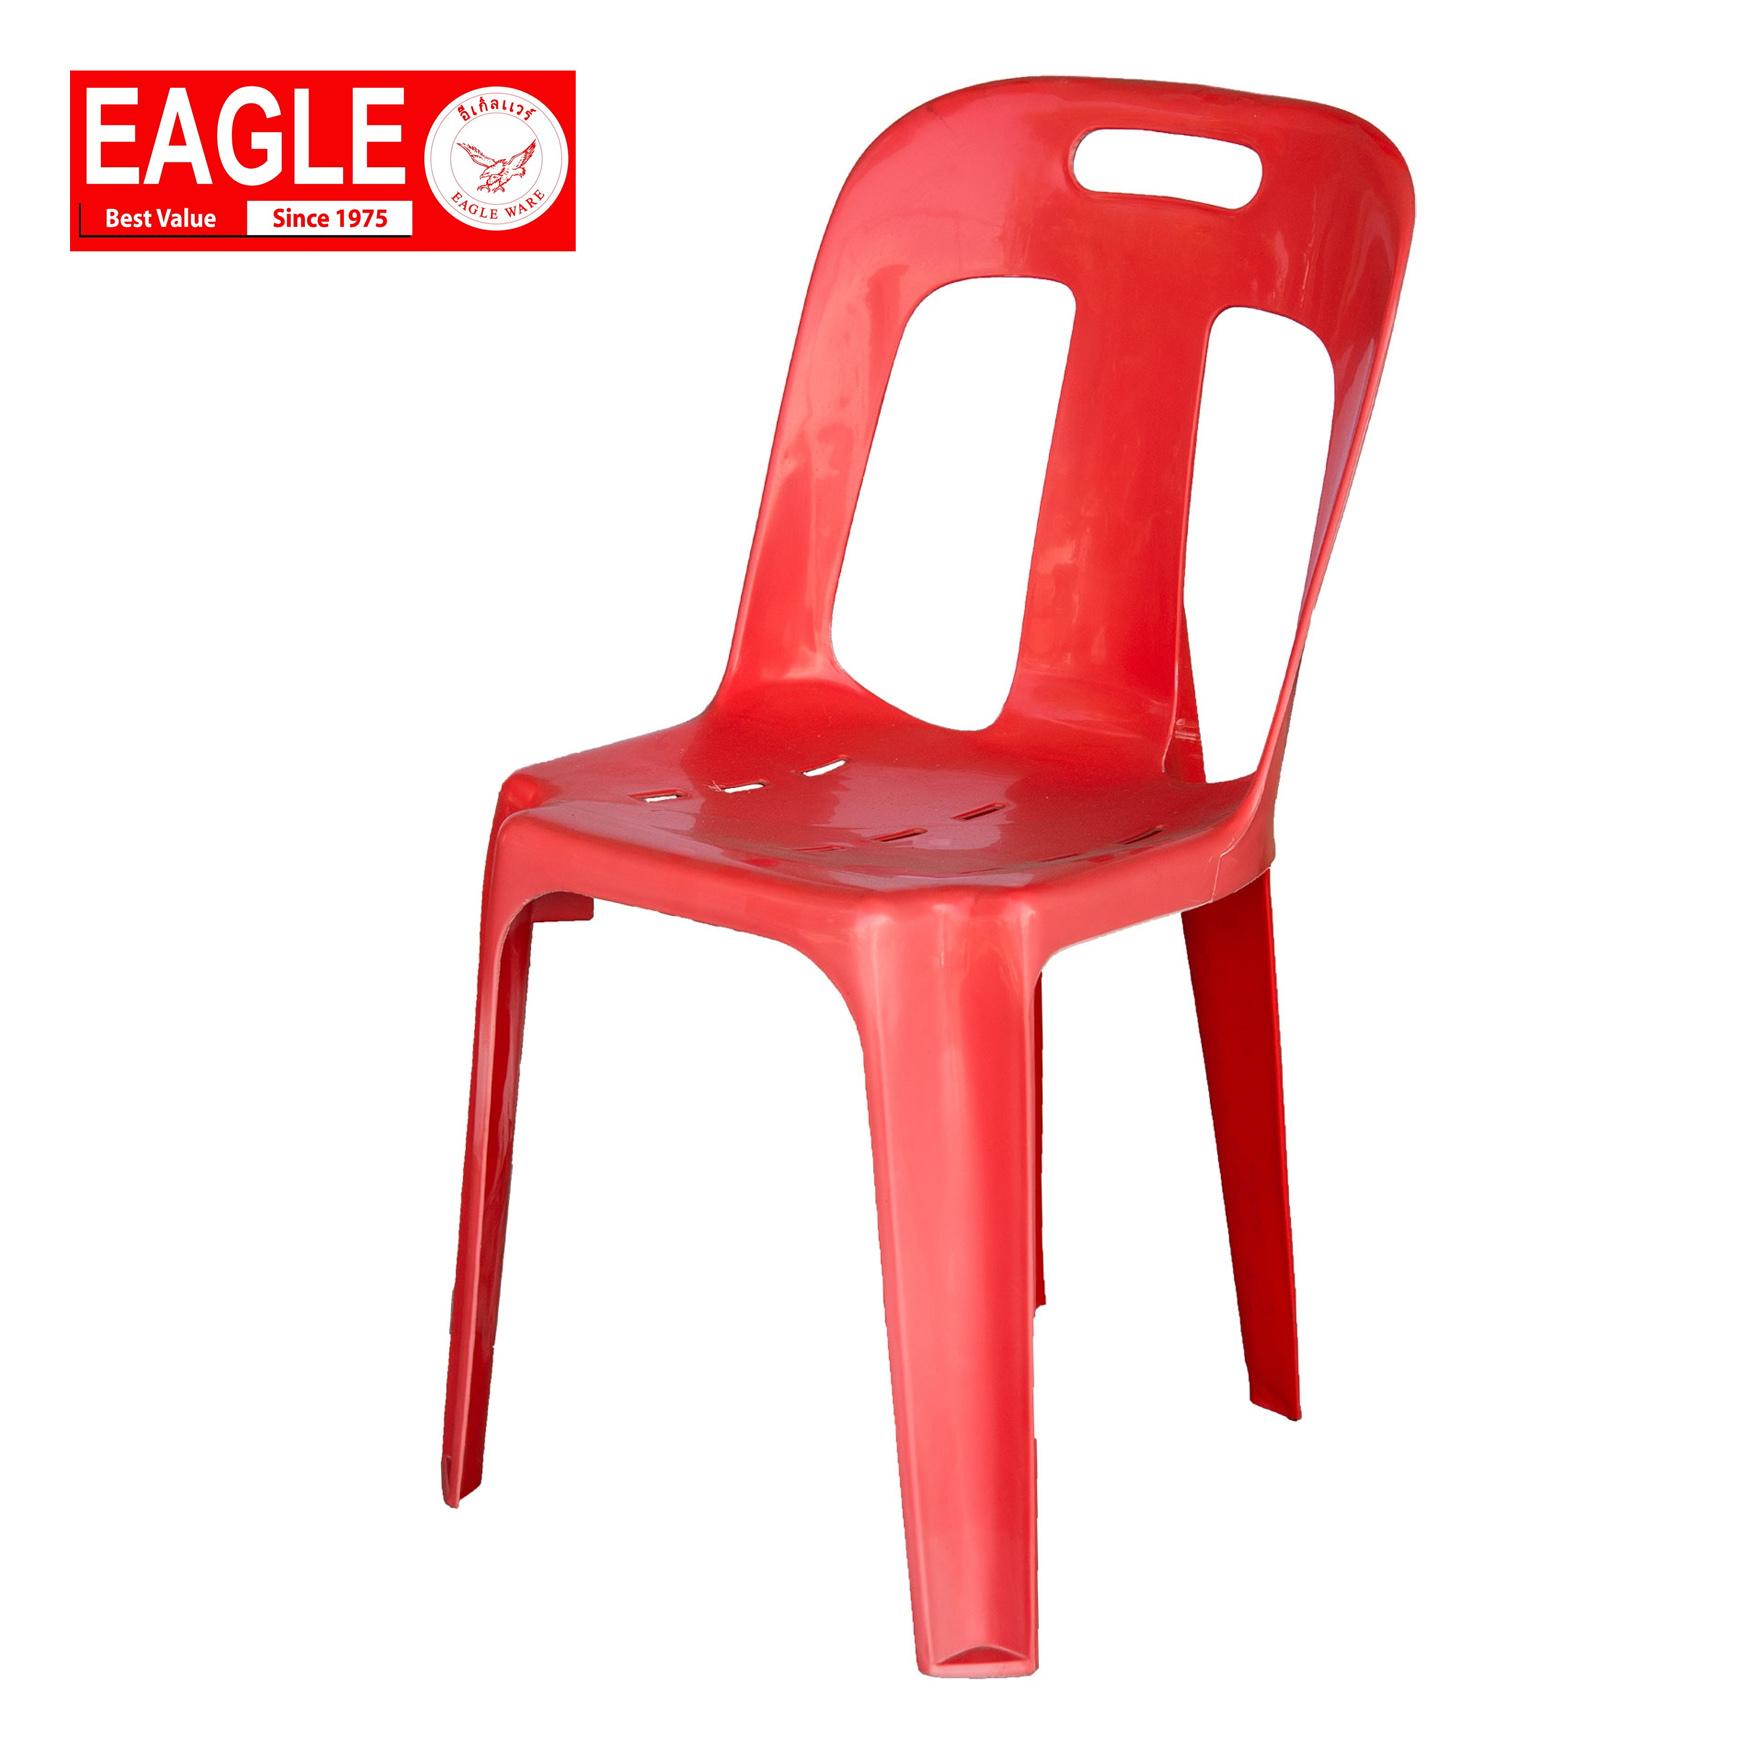 eagle chair red.jpg